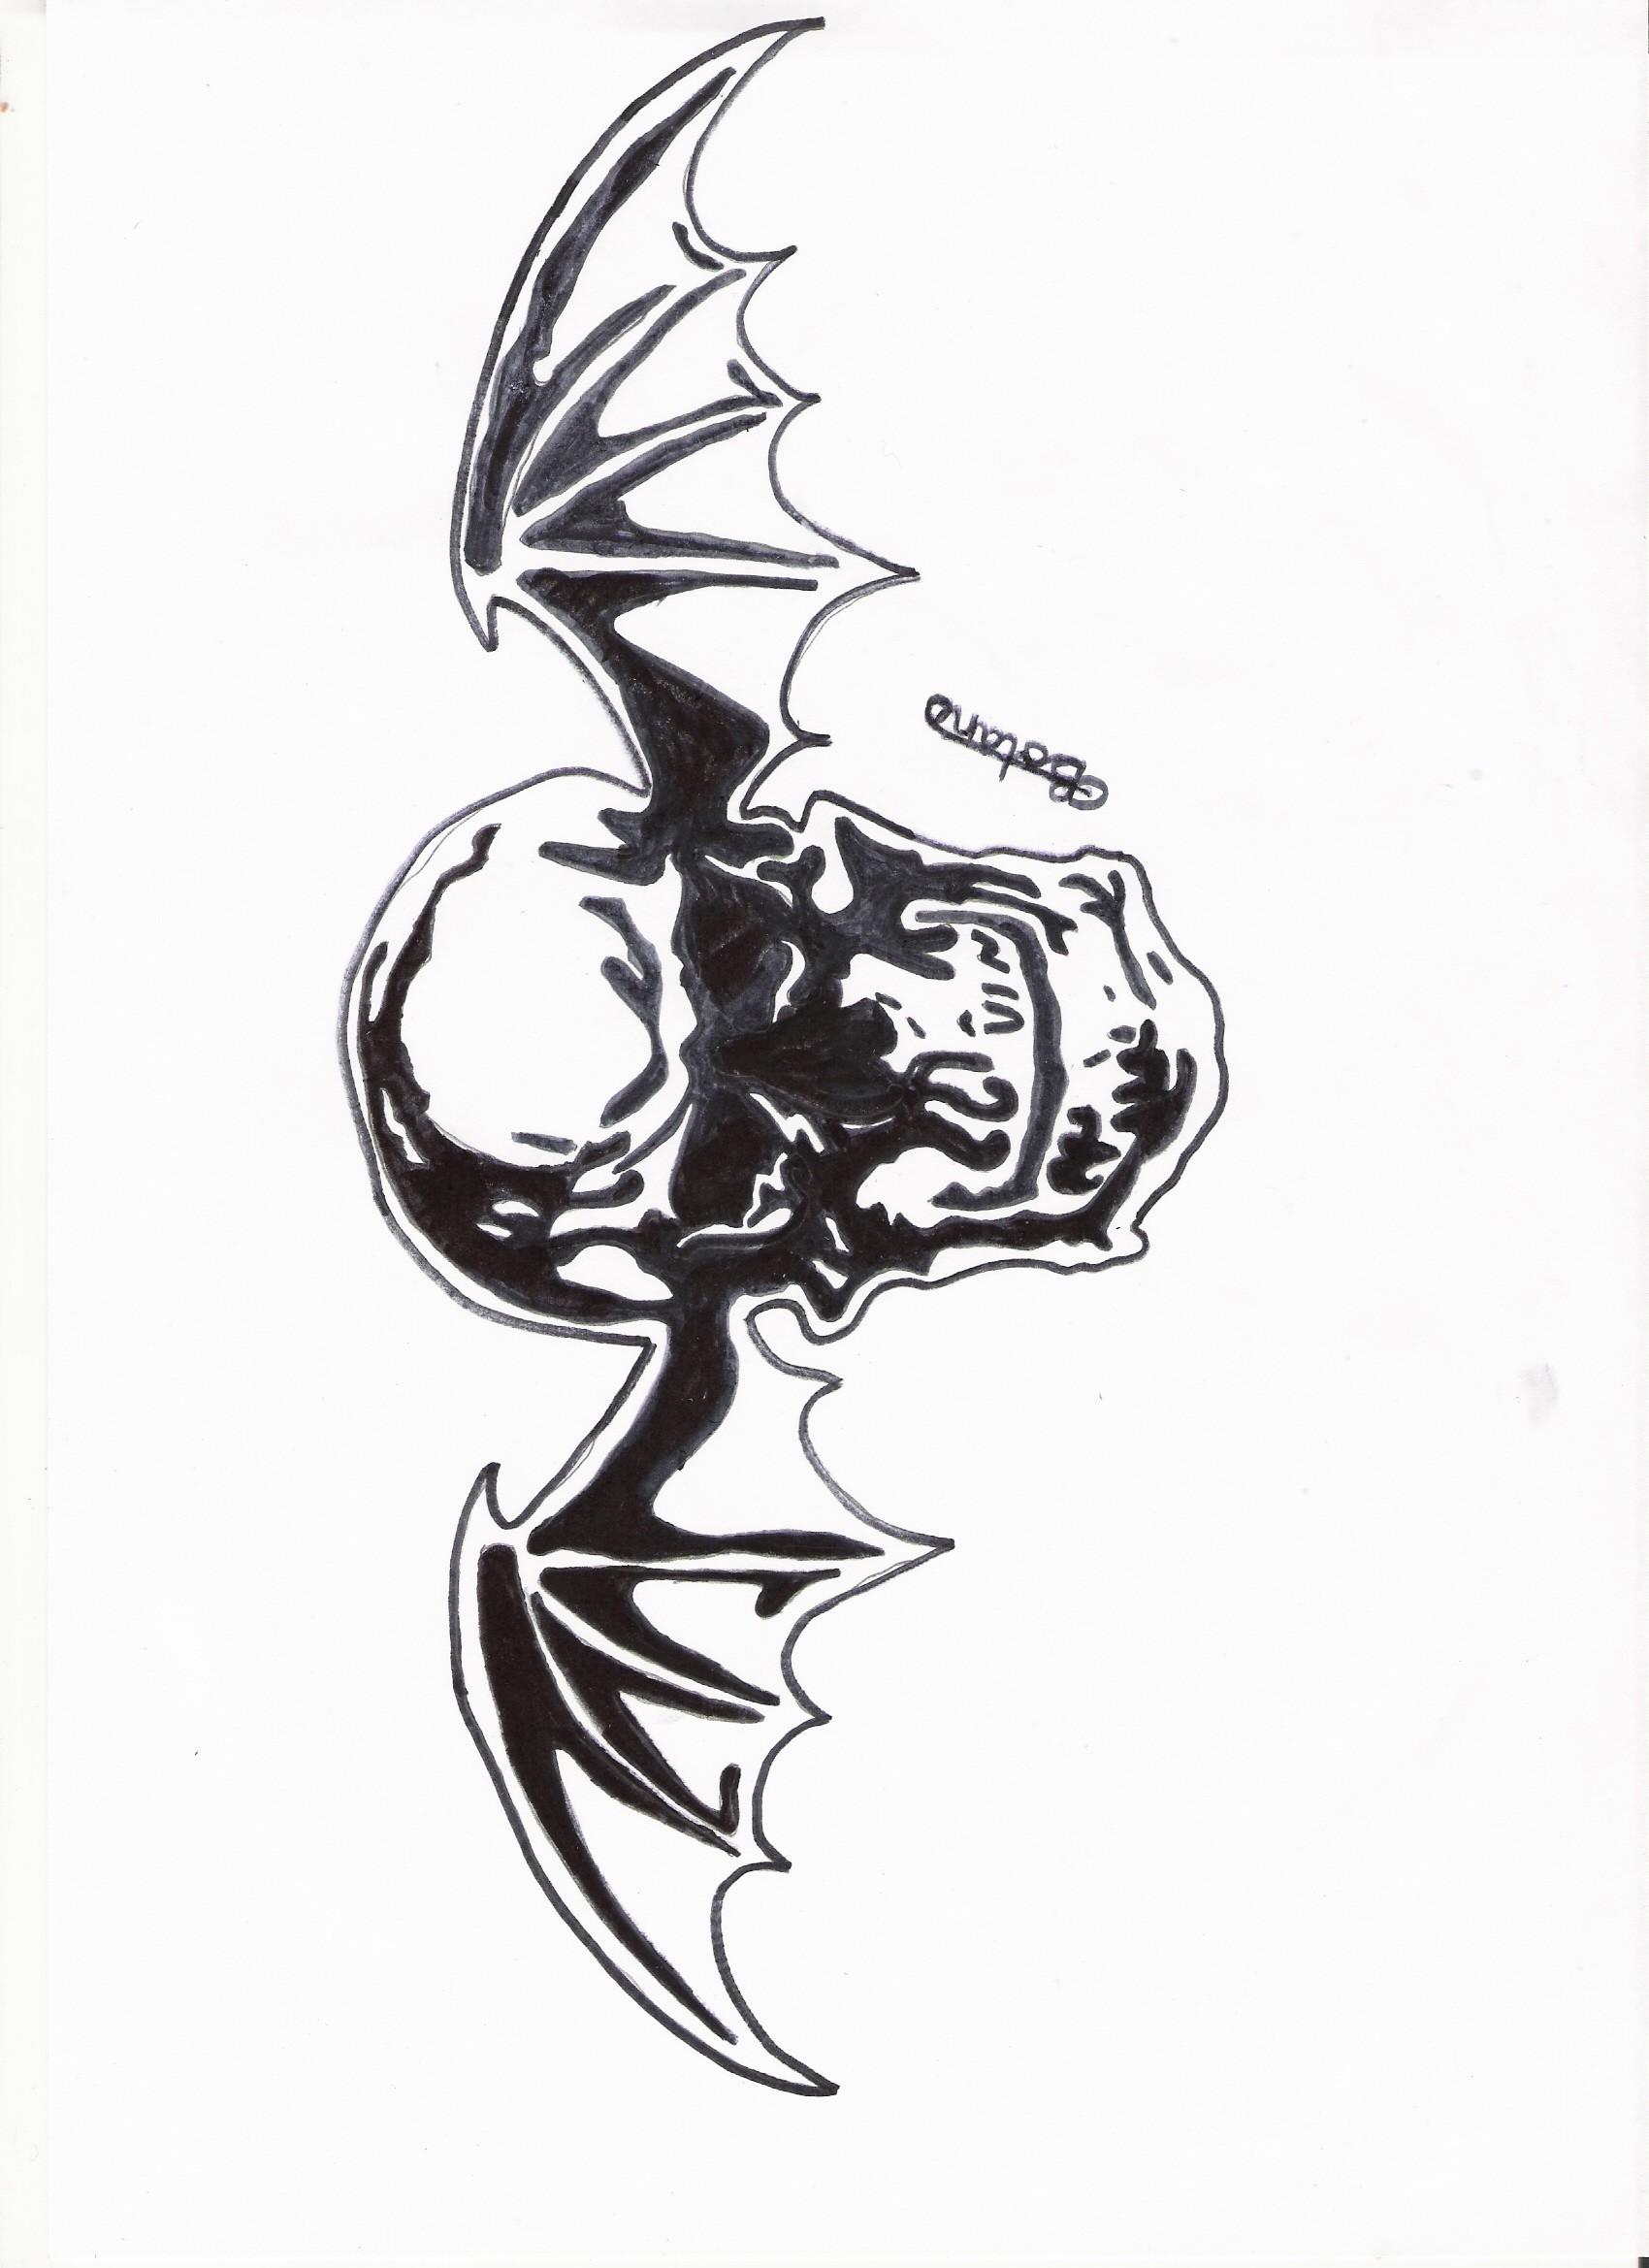 Avenged Sevenfold Deathbat by rockyb123 Avenged Sevenfold Deathbat by  rockyb123